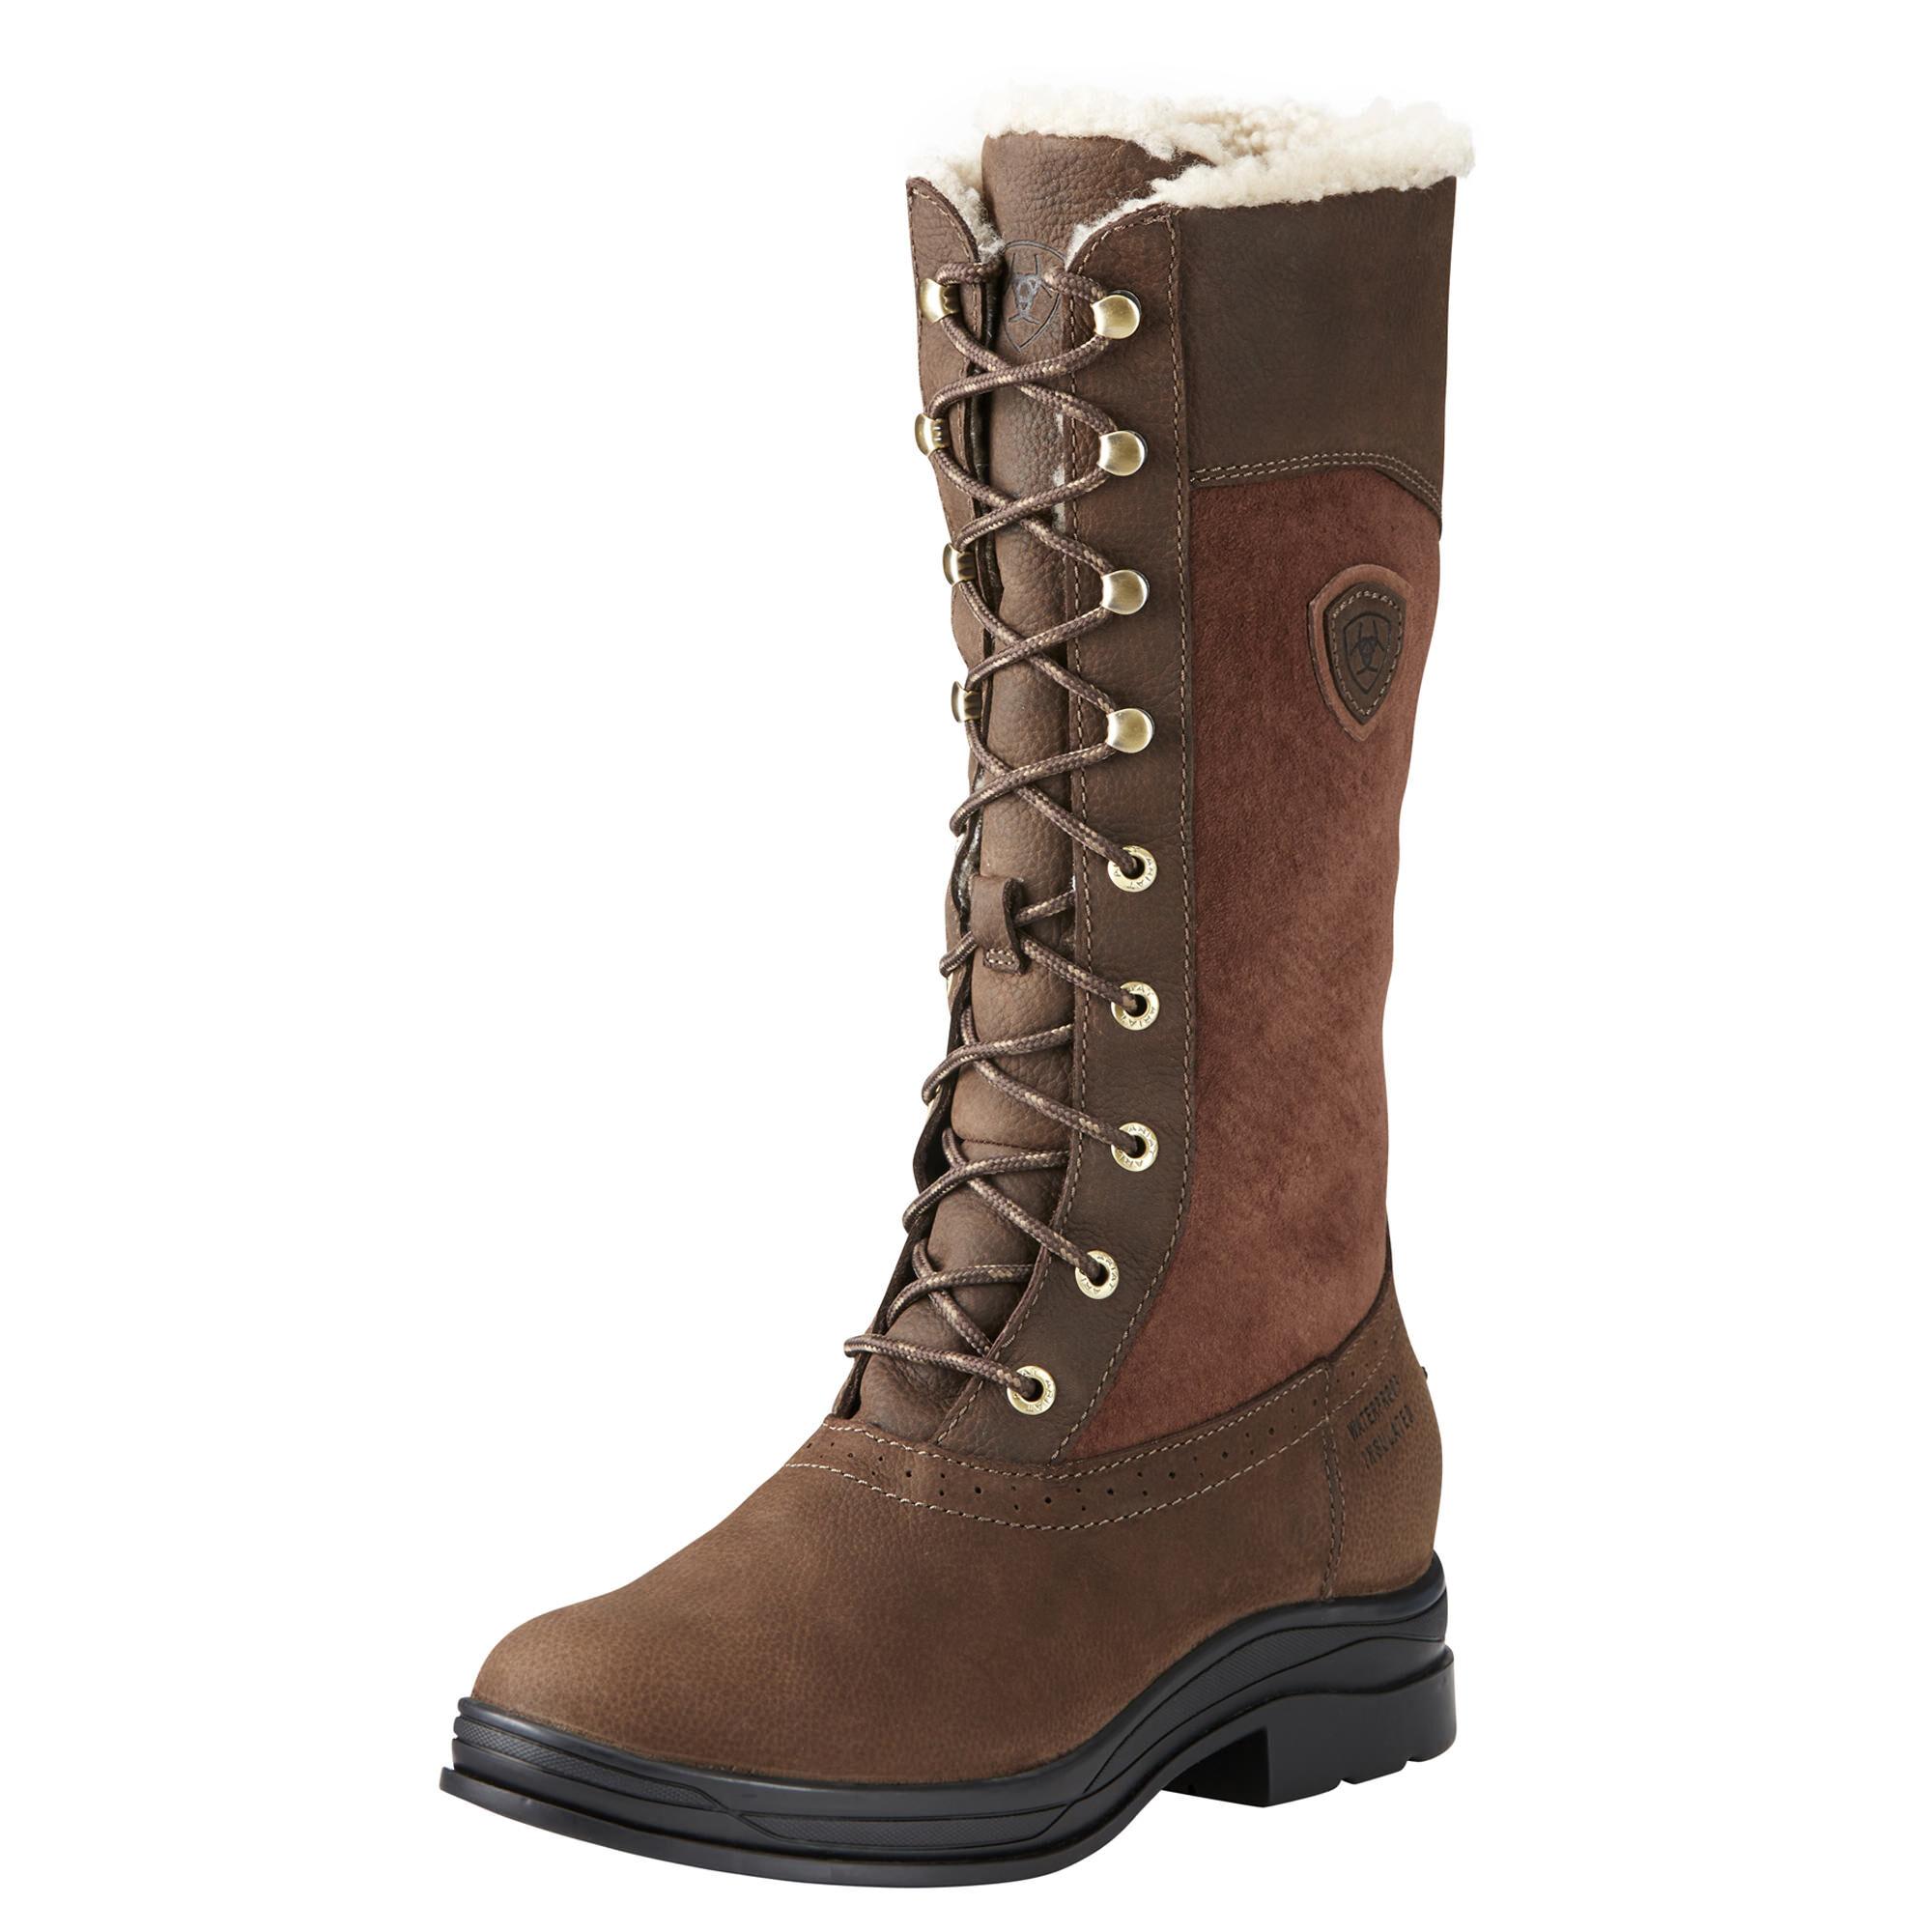 Wythburn Waterproof Insulated Boot